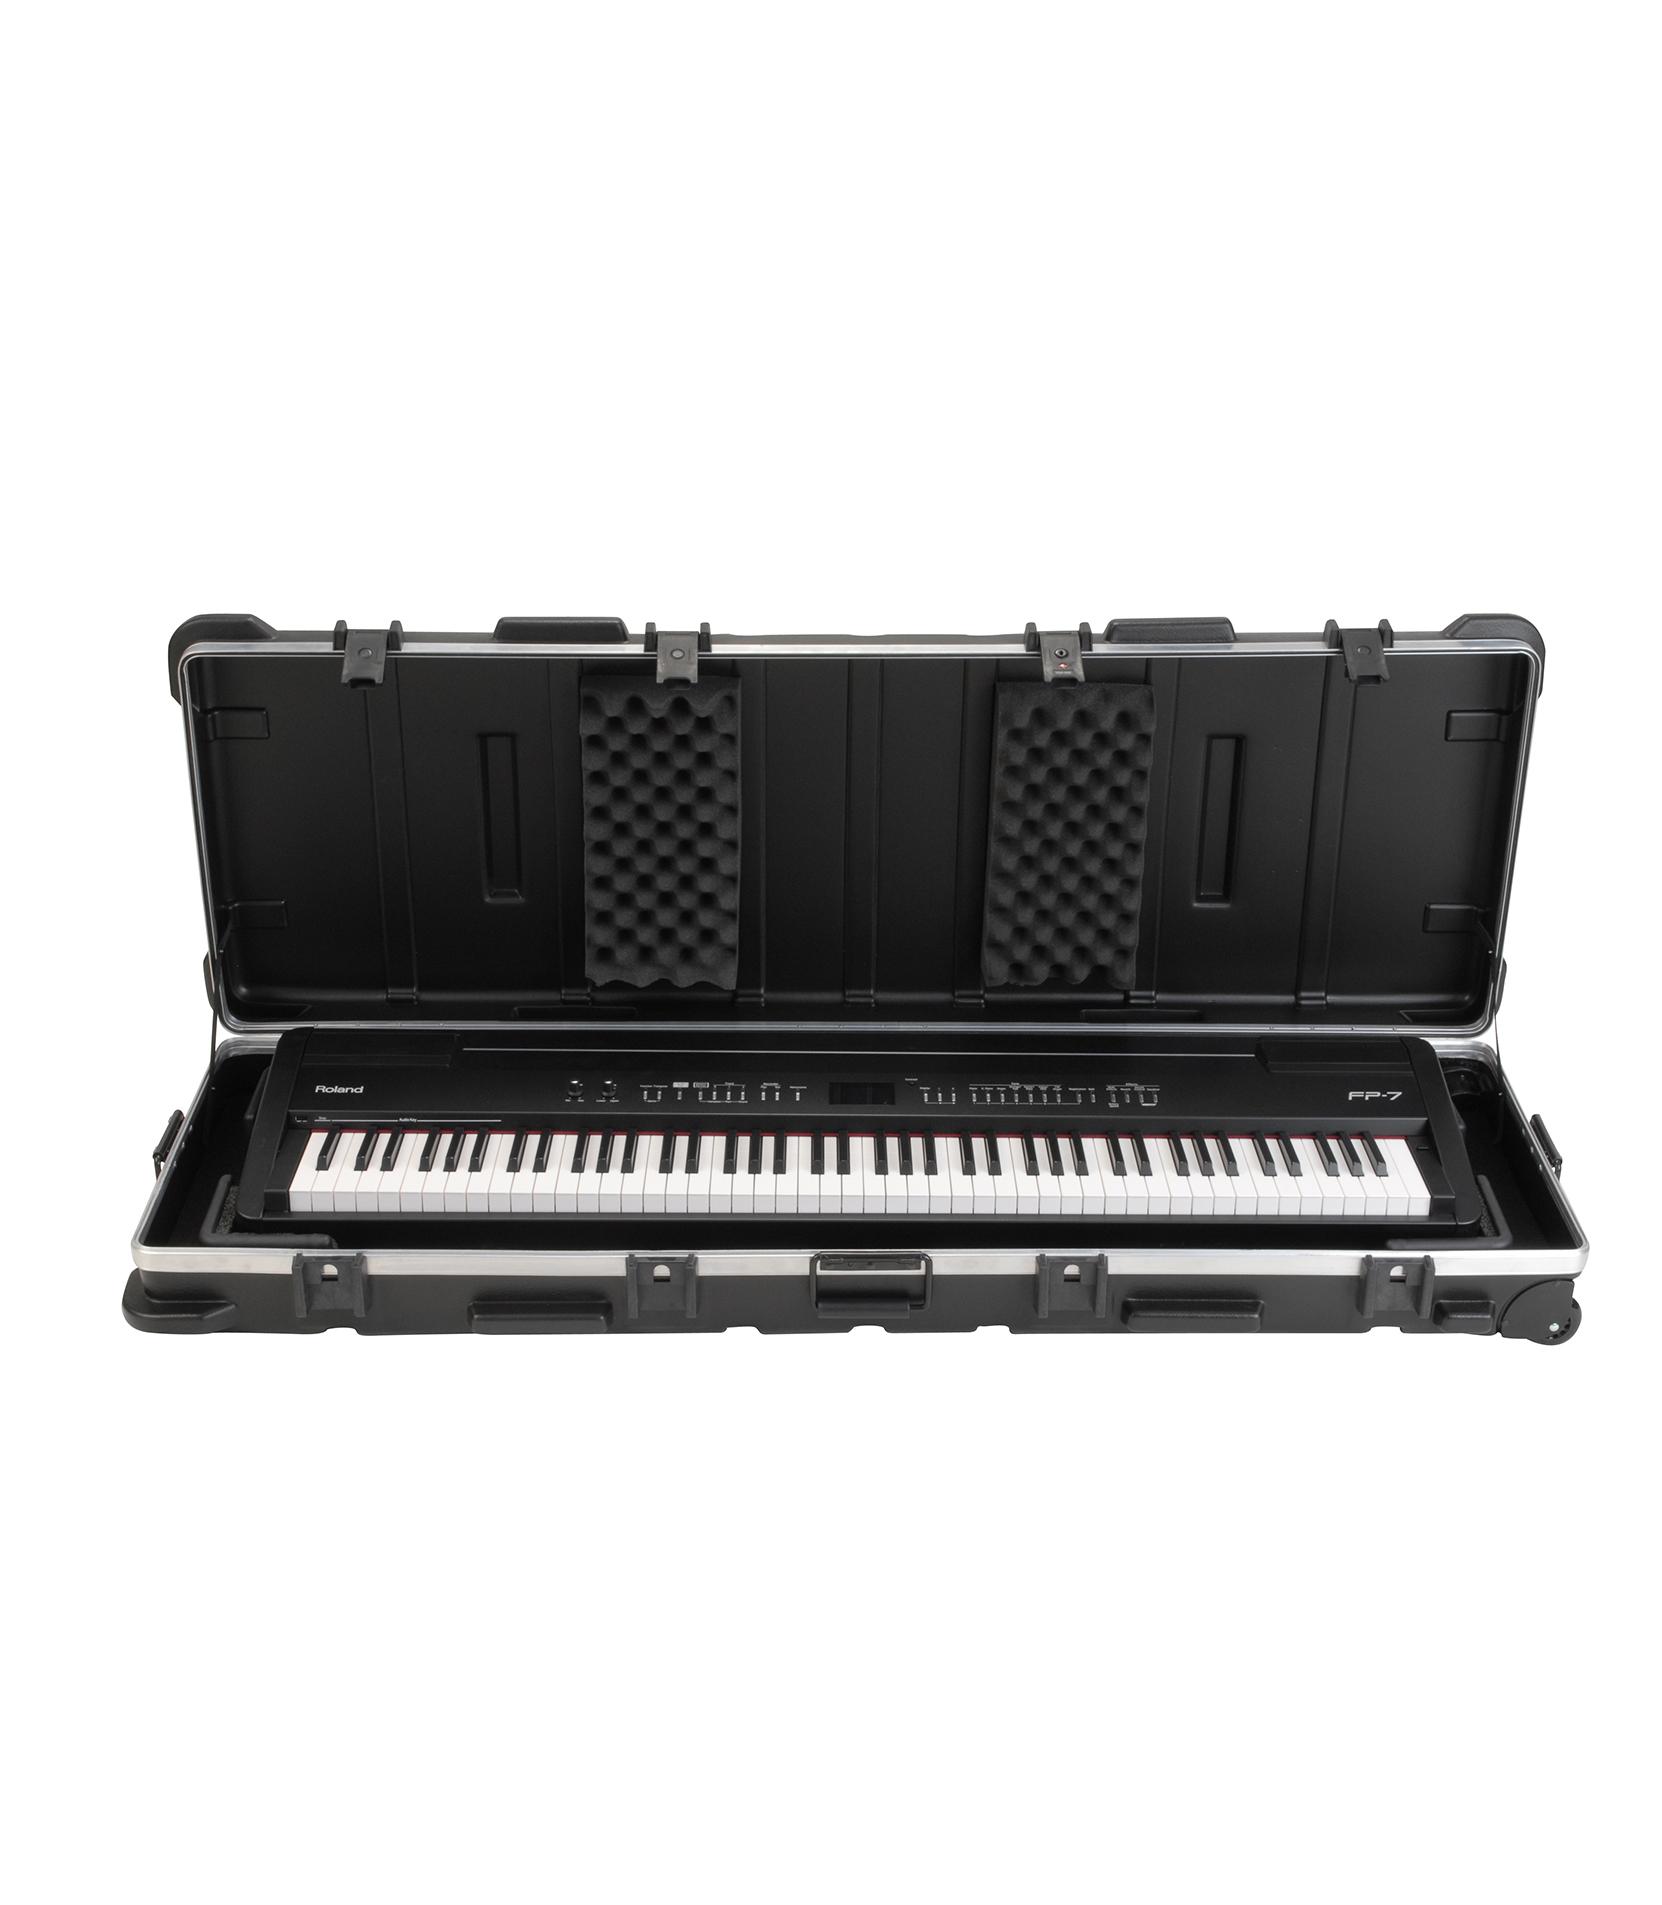 skb - 1SKB 5817W ATA 88 Note Slim Line Keyboard Case w W - Melody House